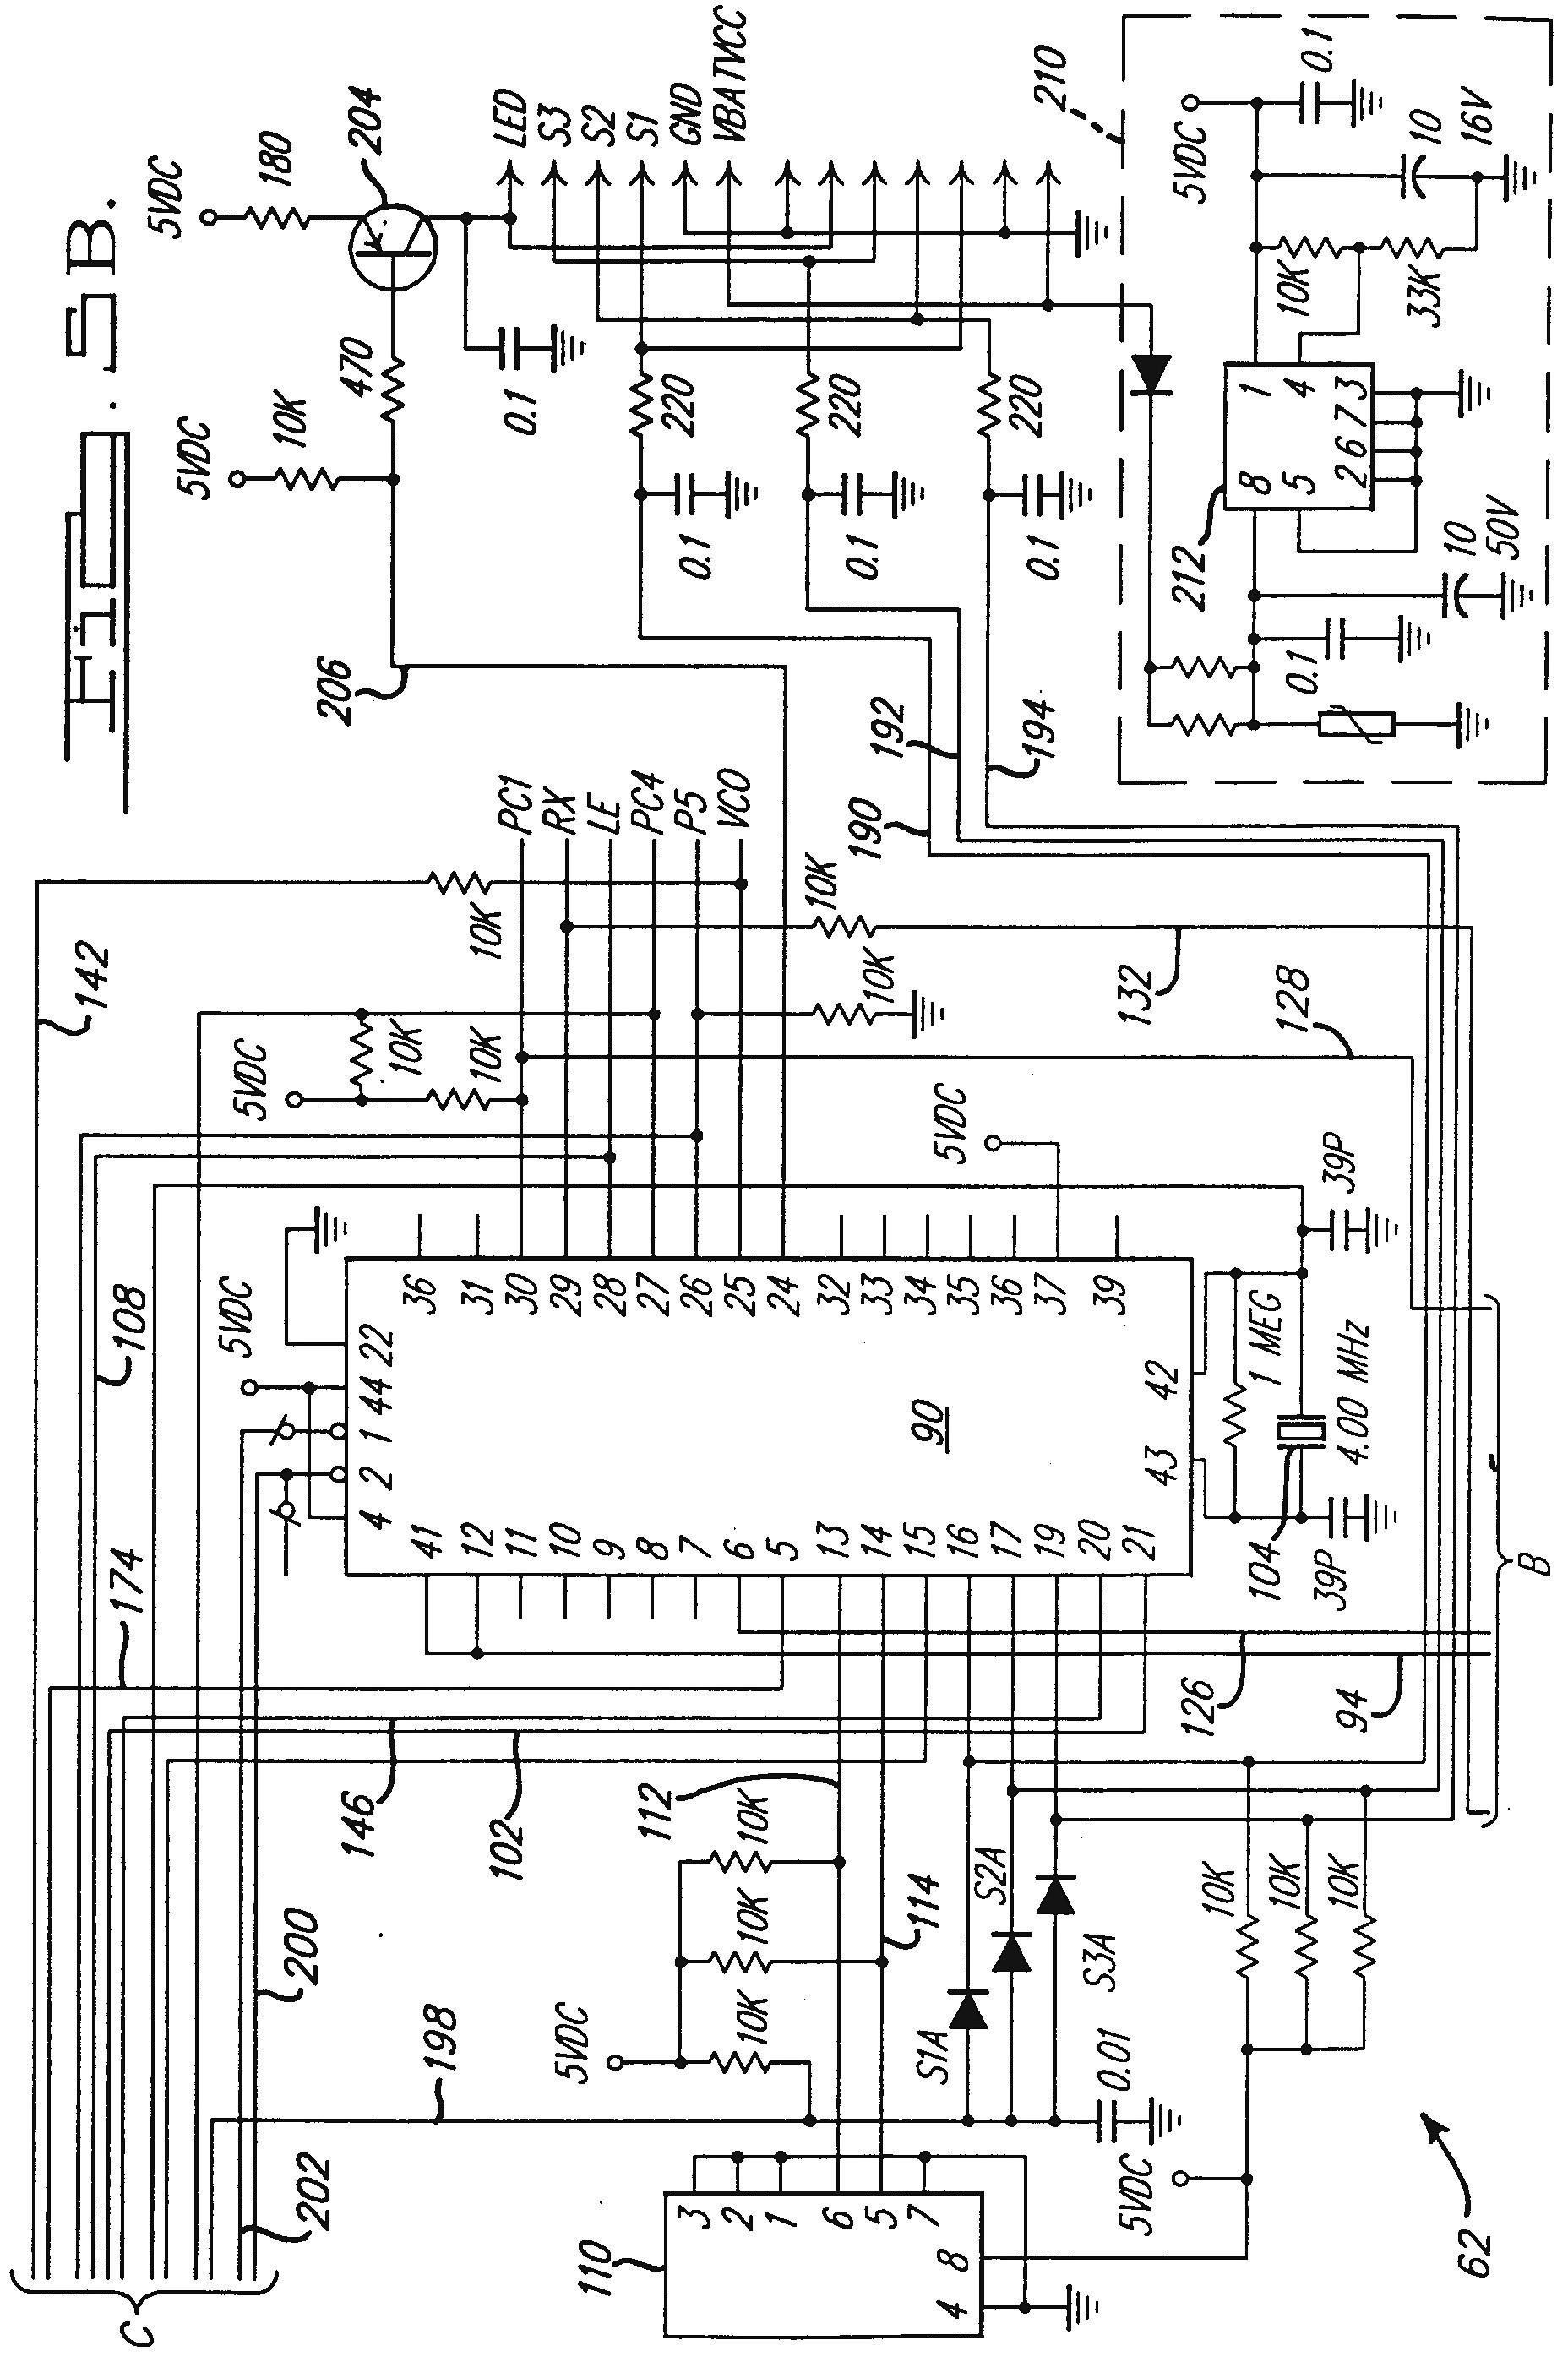 genie circuit board